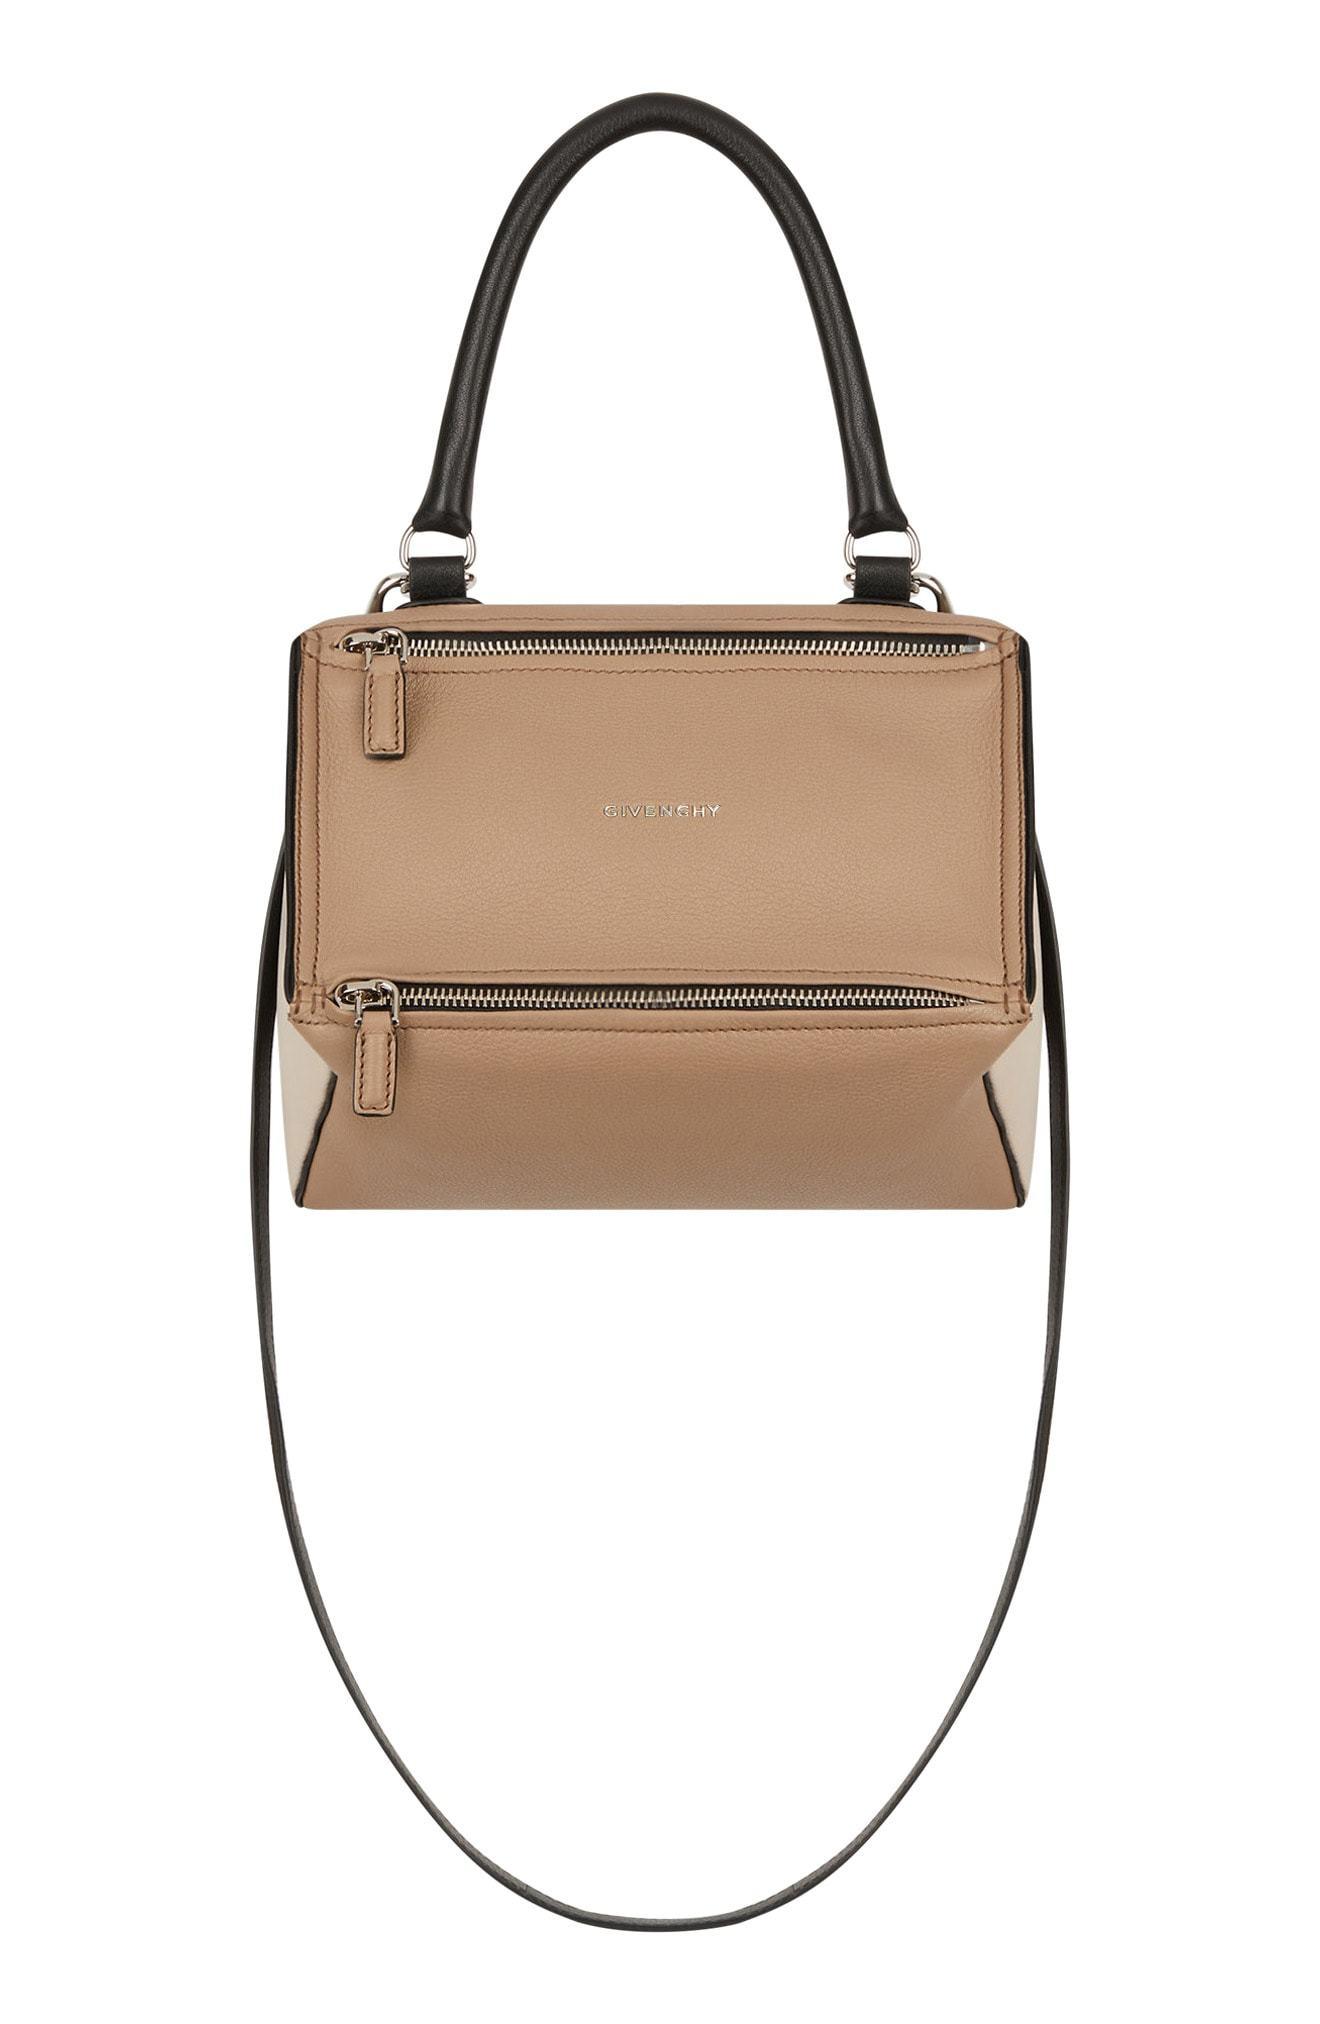 e03d4465436 Givenchy Small Pandora Box Tricolor Leather Crossbody Bag, $1,990 ...